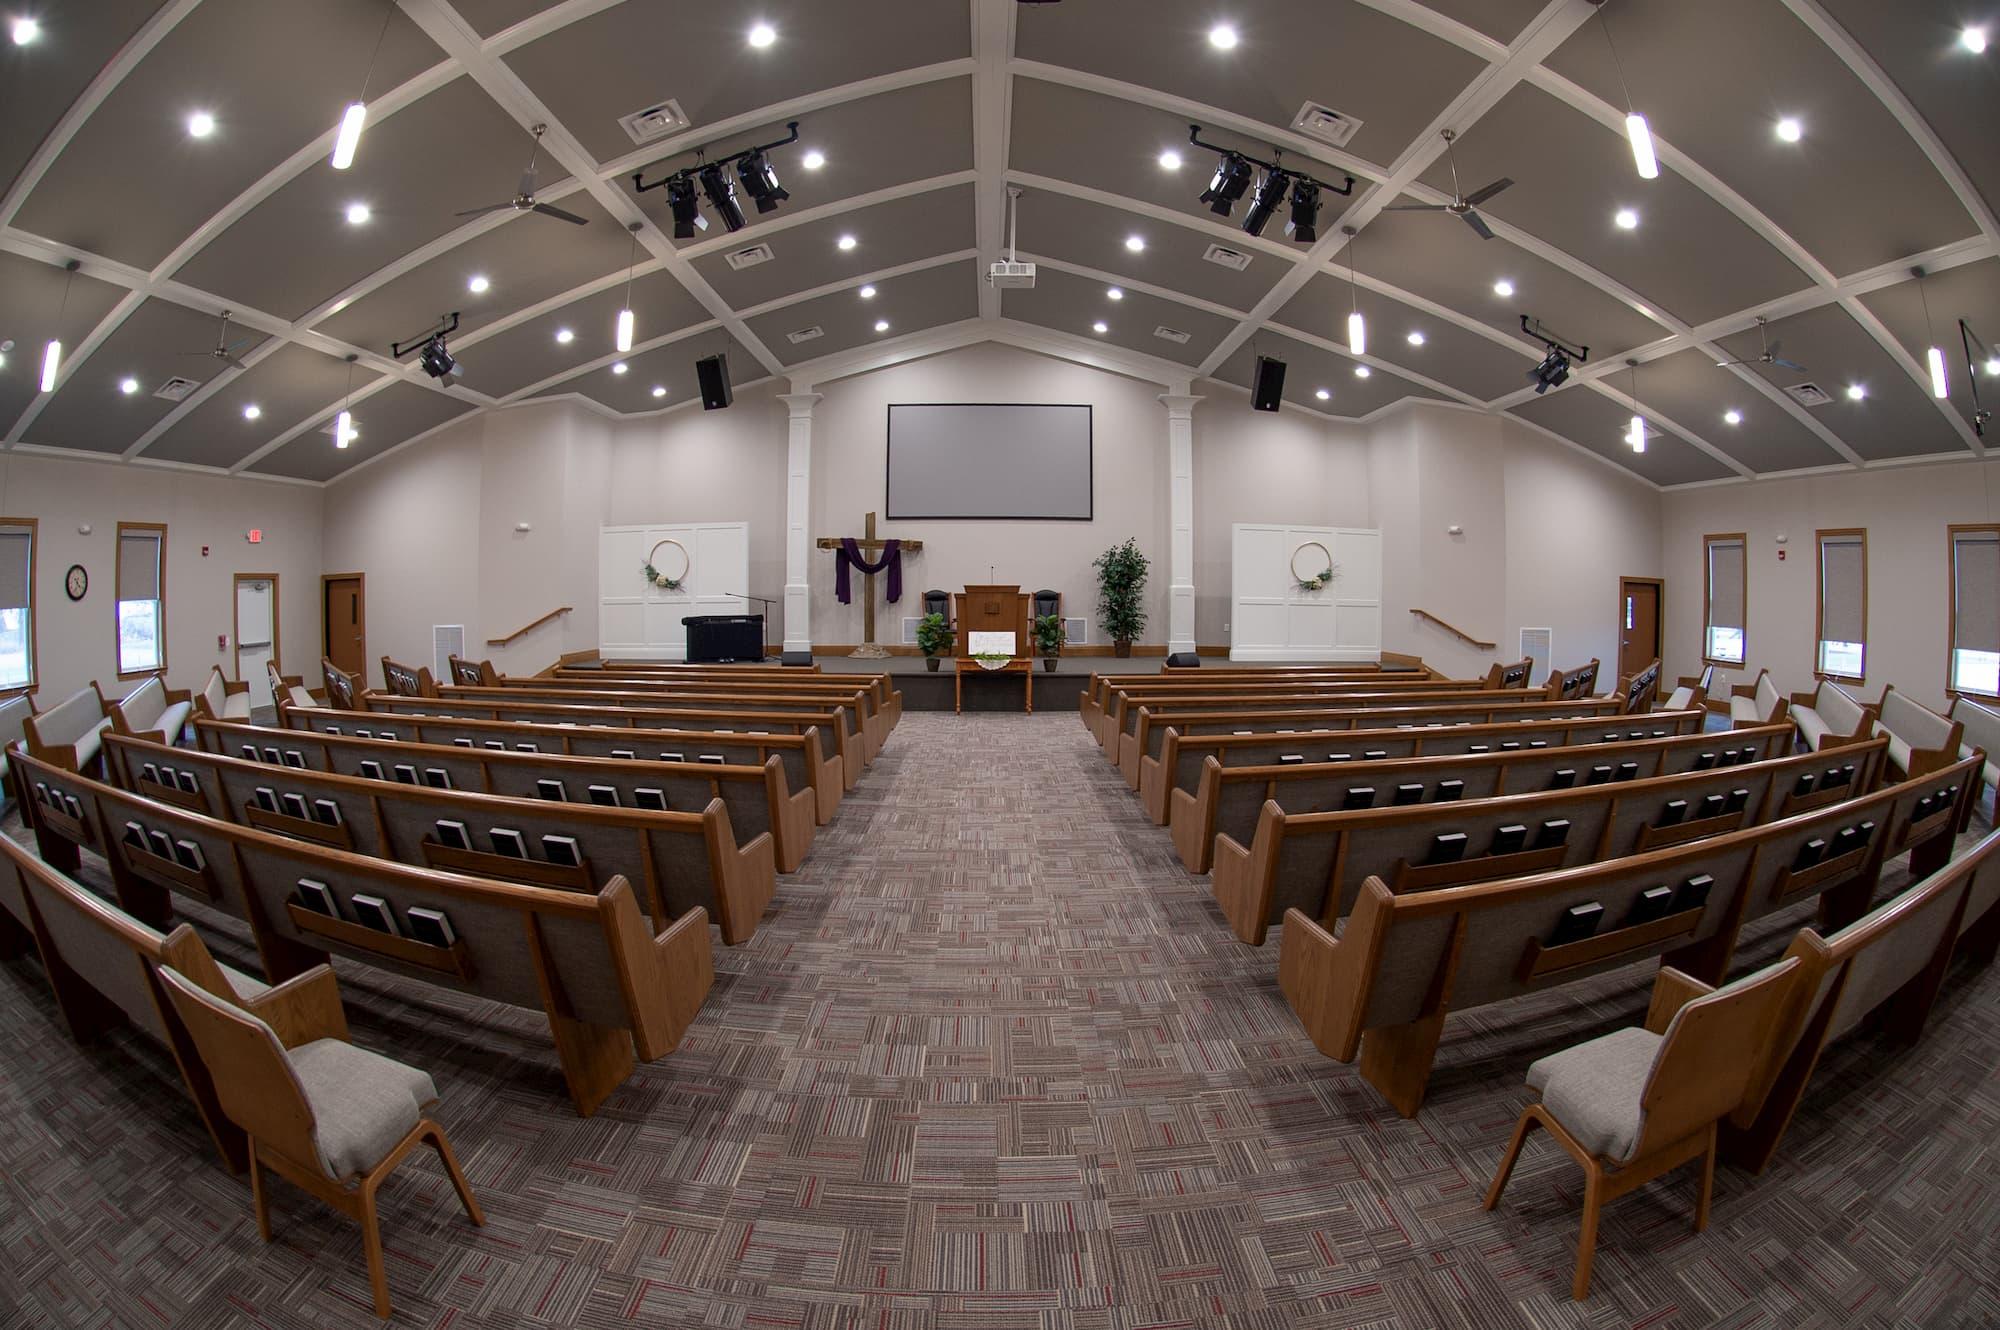 New Construction Church Auditorium